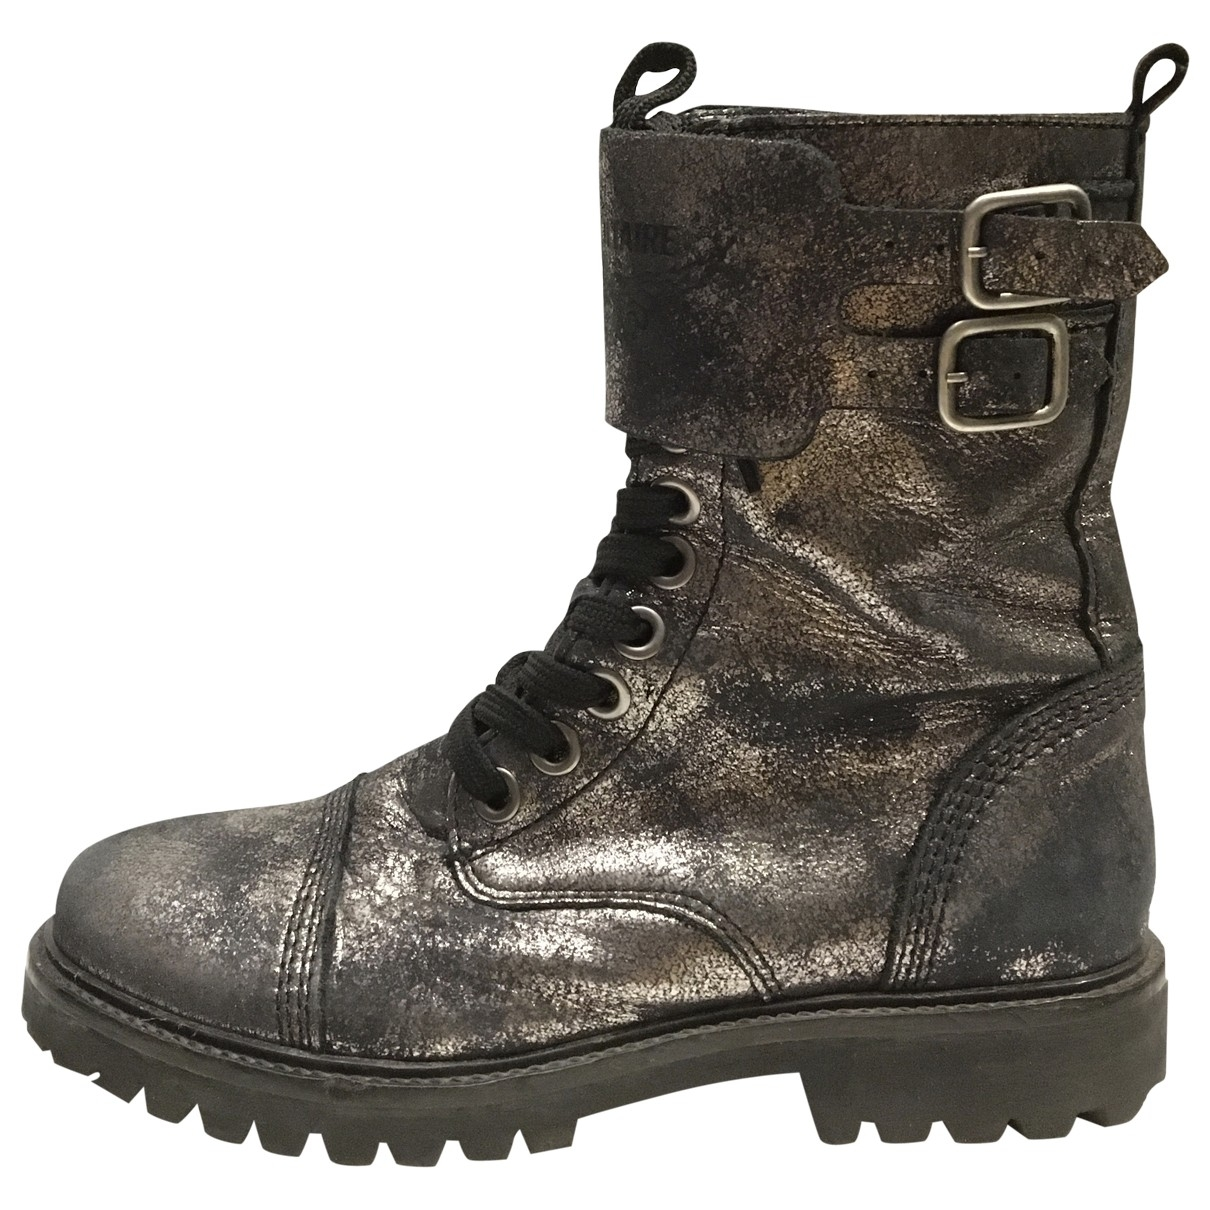 Zadig & Voltaire Joe Black Glitter Boots for Women 37 EU